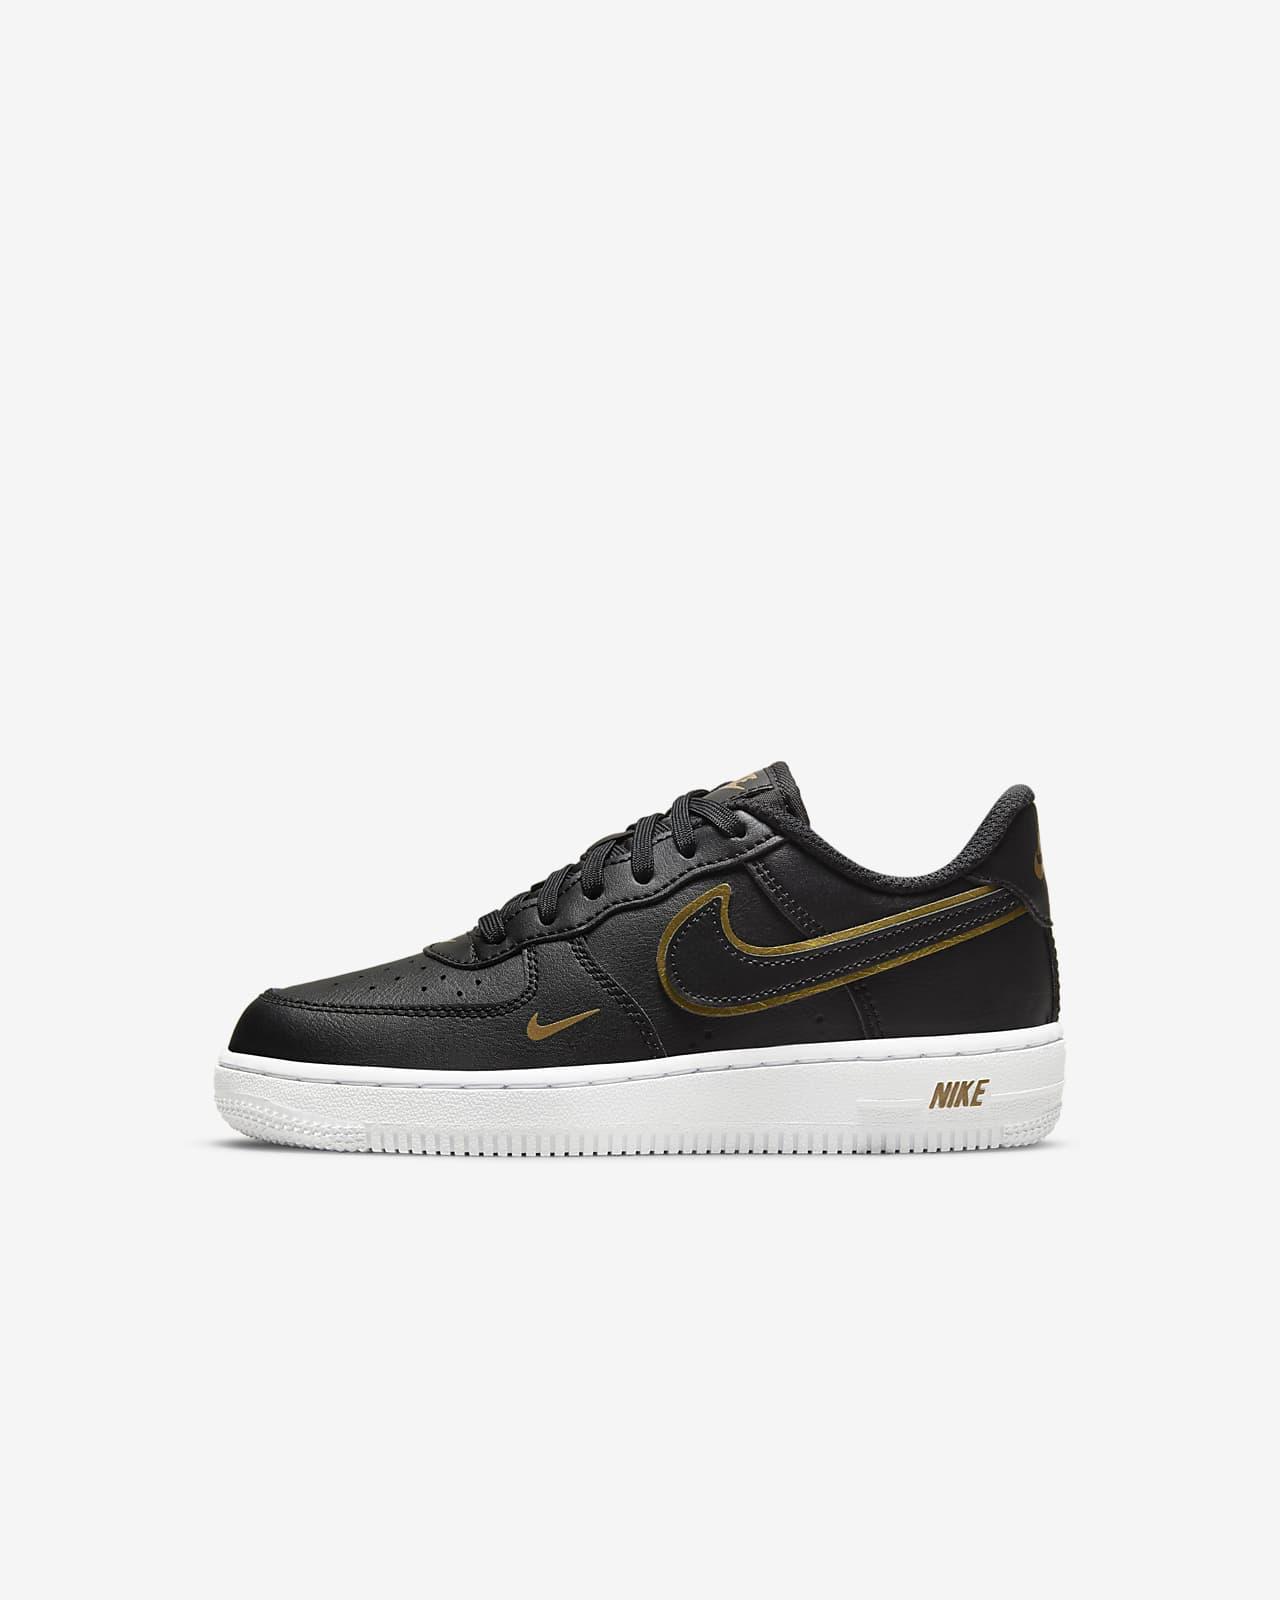 Nike Force 1 LV8 Little Kids' Shoes